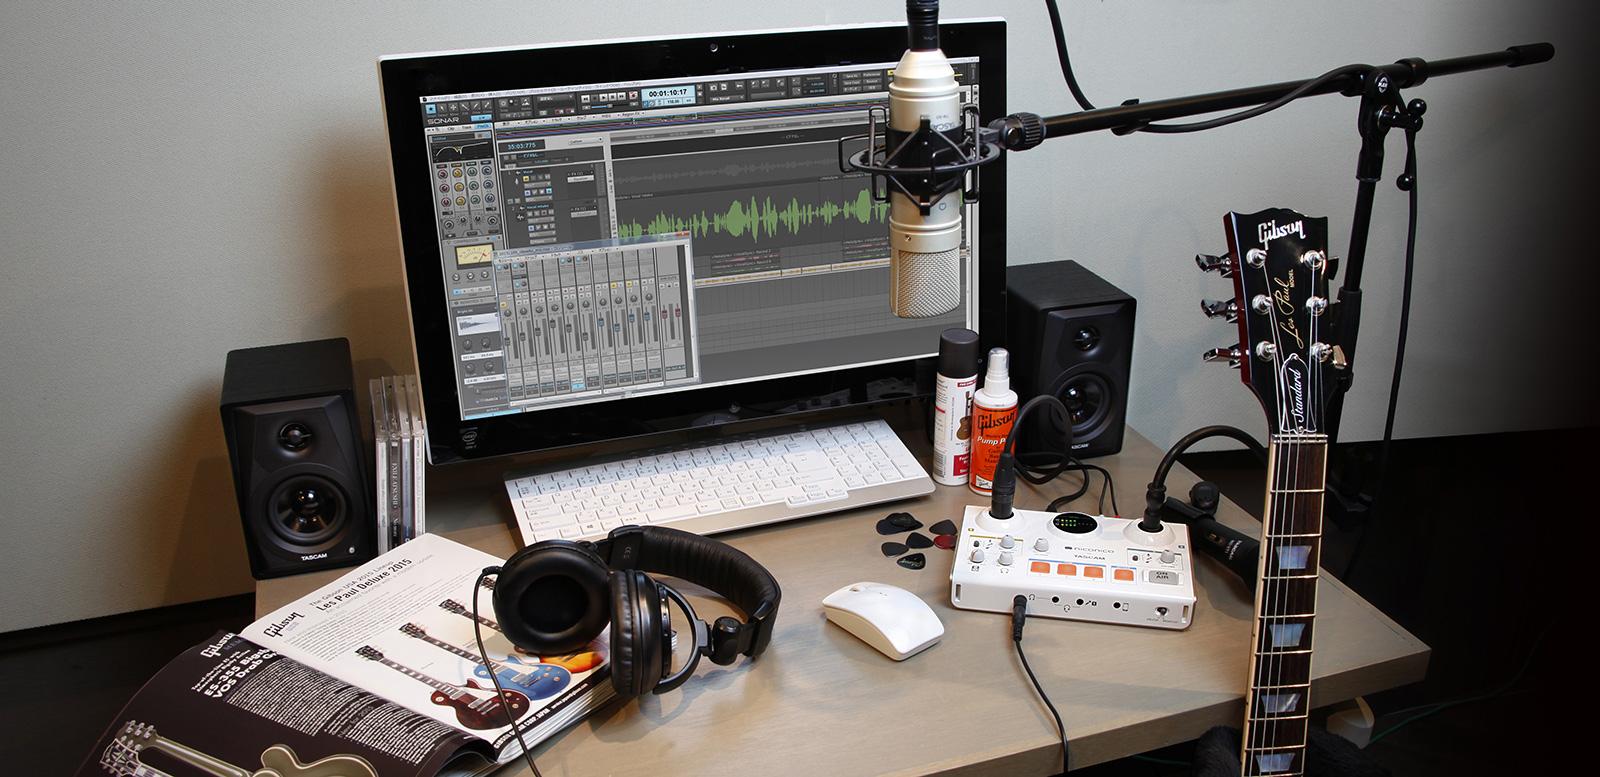 MiNiSTUDIO  - ממשקי קול ייעודיים לשידור ולדור האינטרנט מ- TASCAM